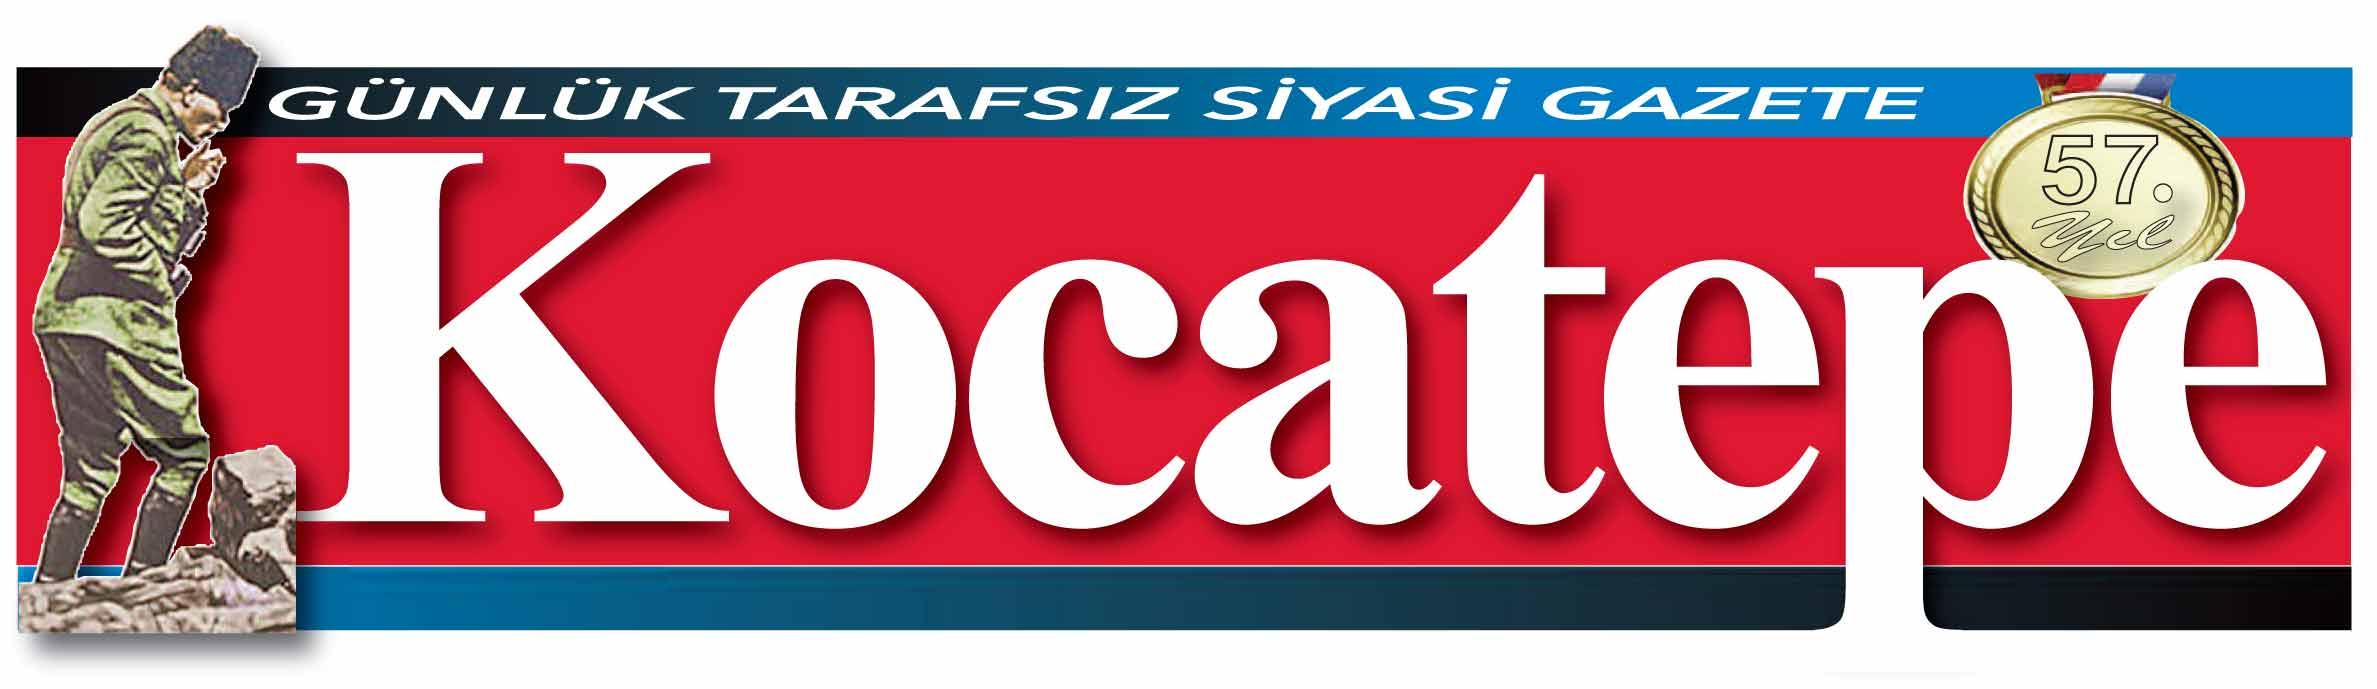 Kocatepe Gazetesi